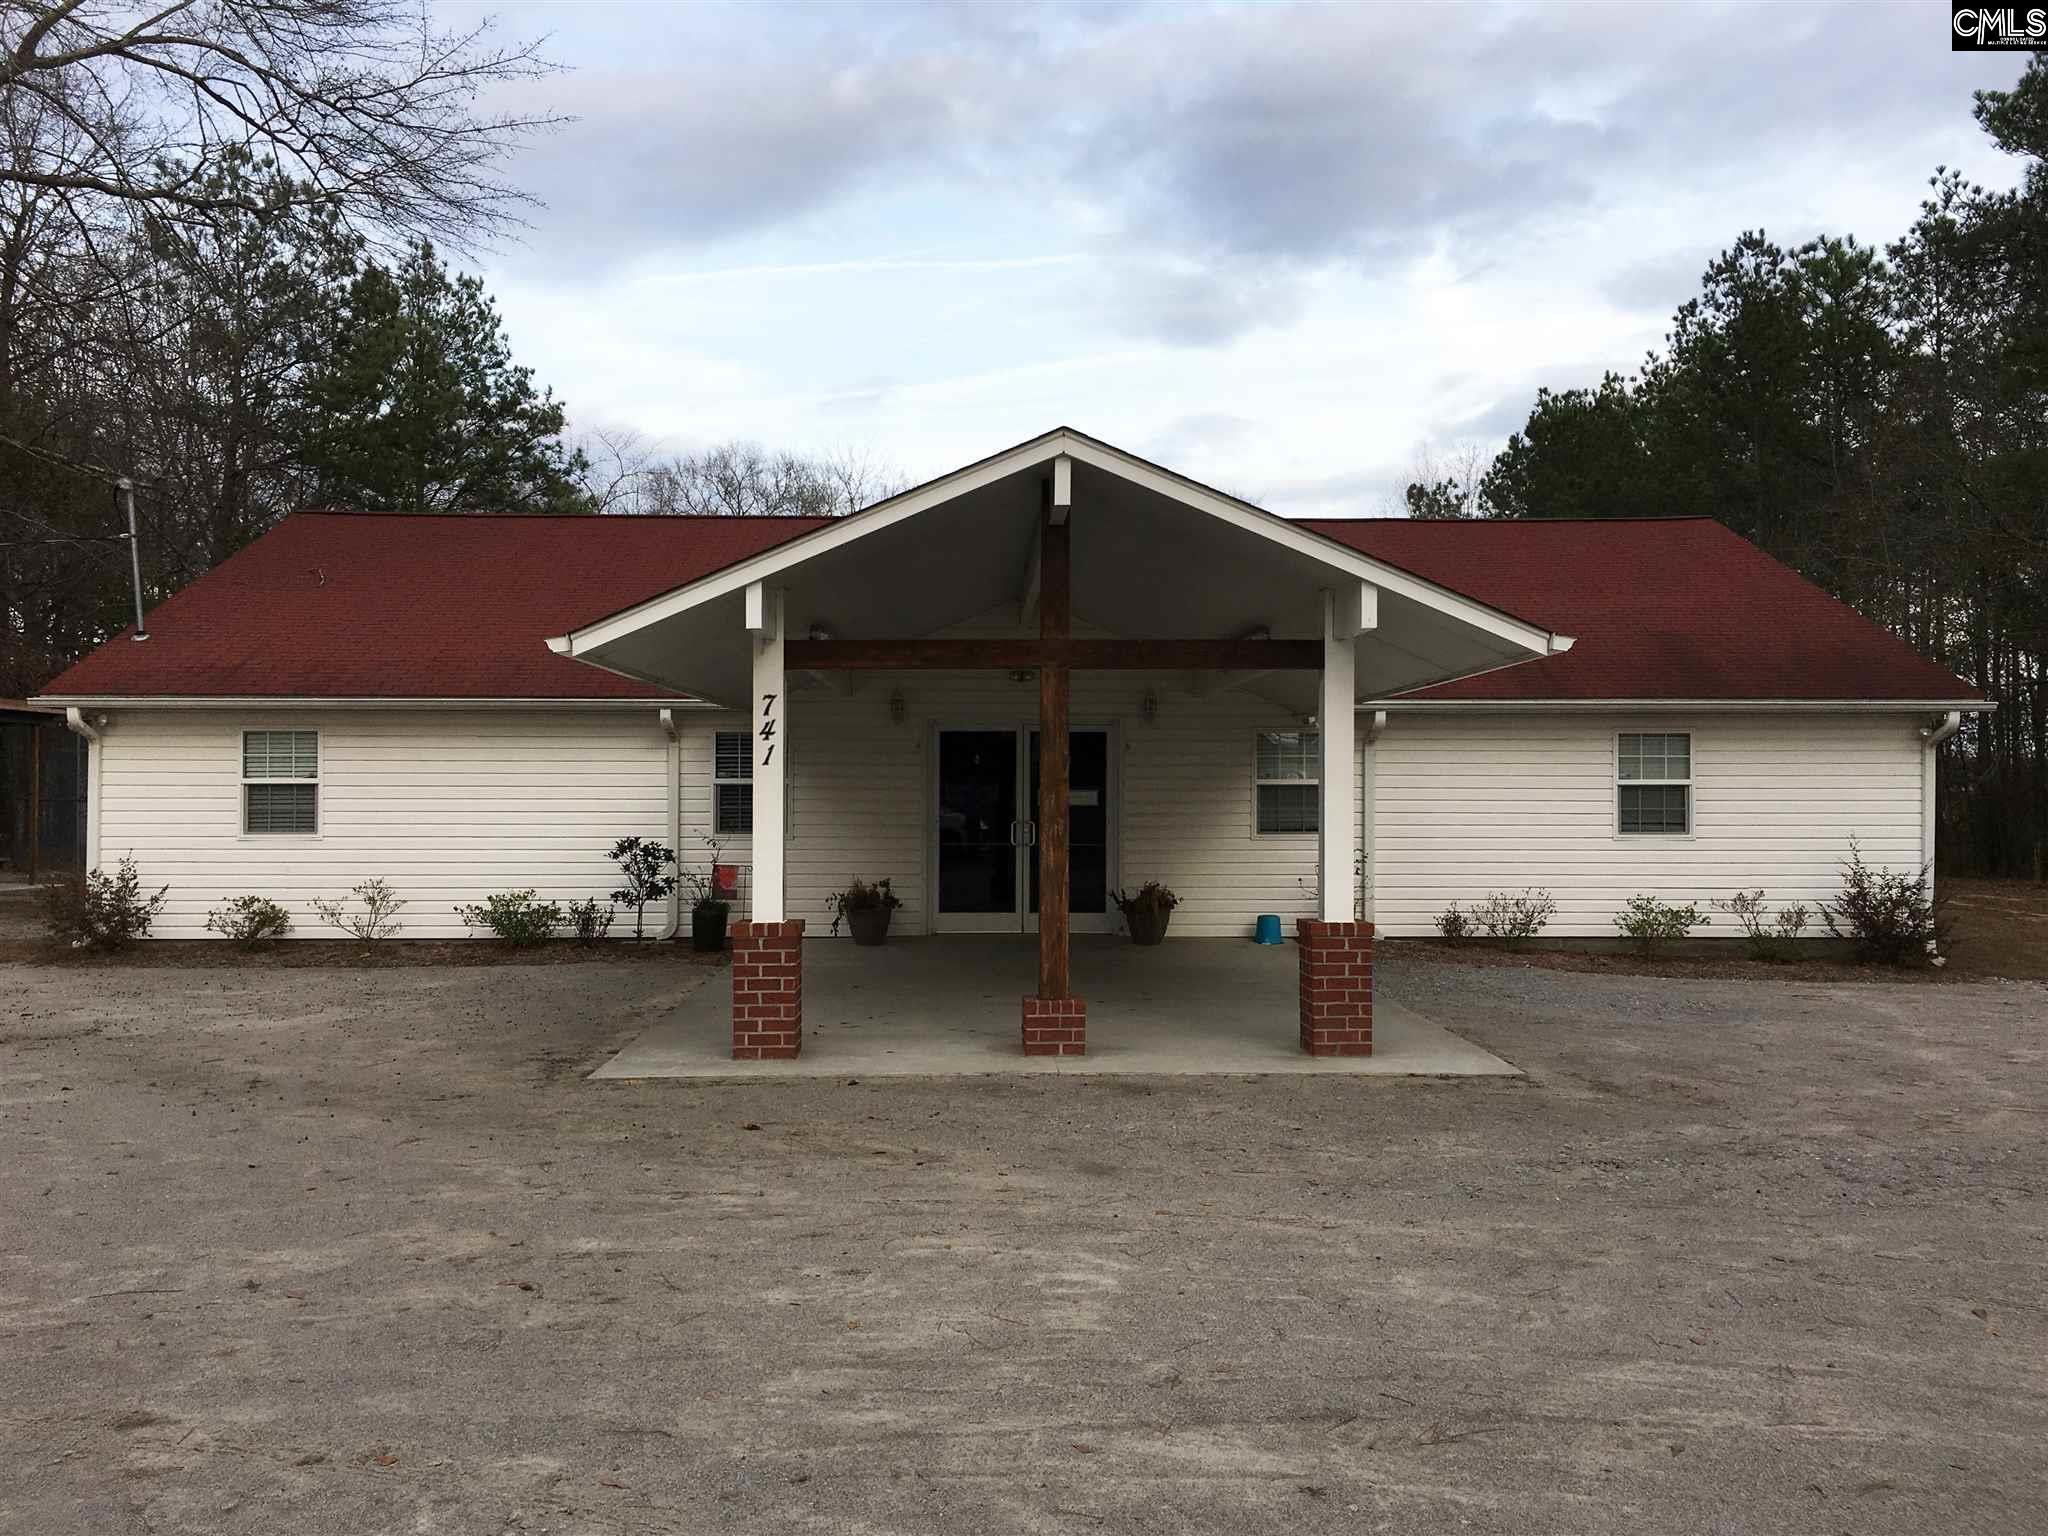 741 Dixiana Road Cayce, SC 29172-3125